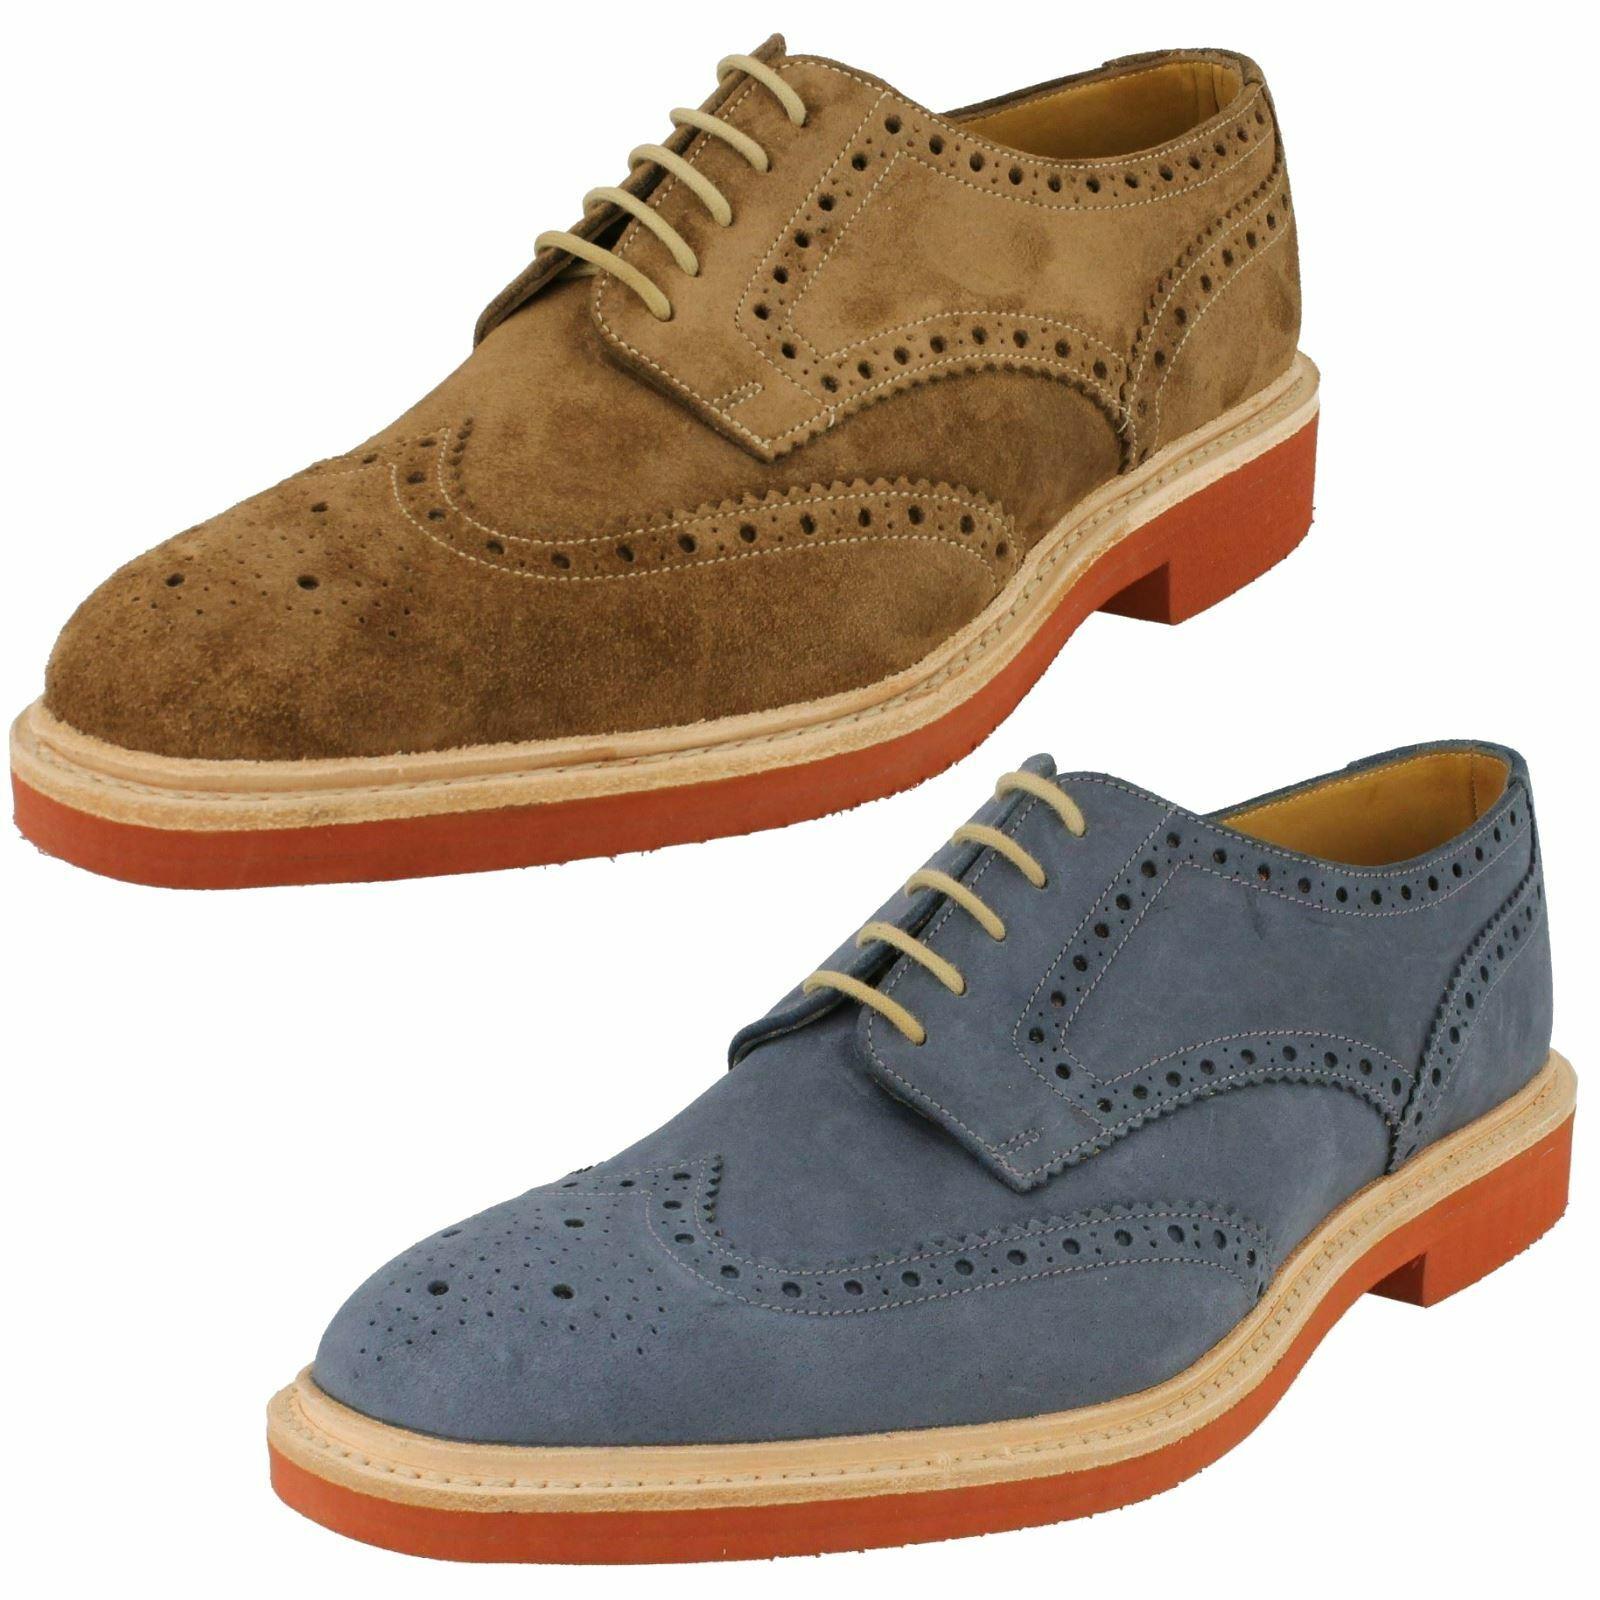 Loake Homme Chaussures De Loisirs Logan